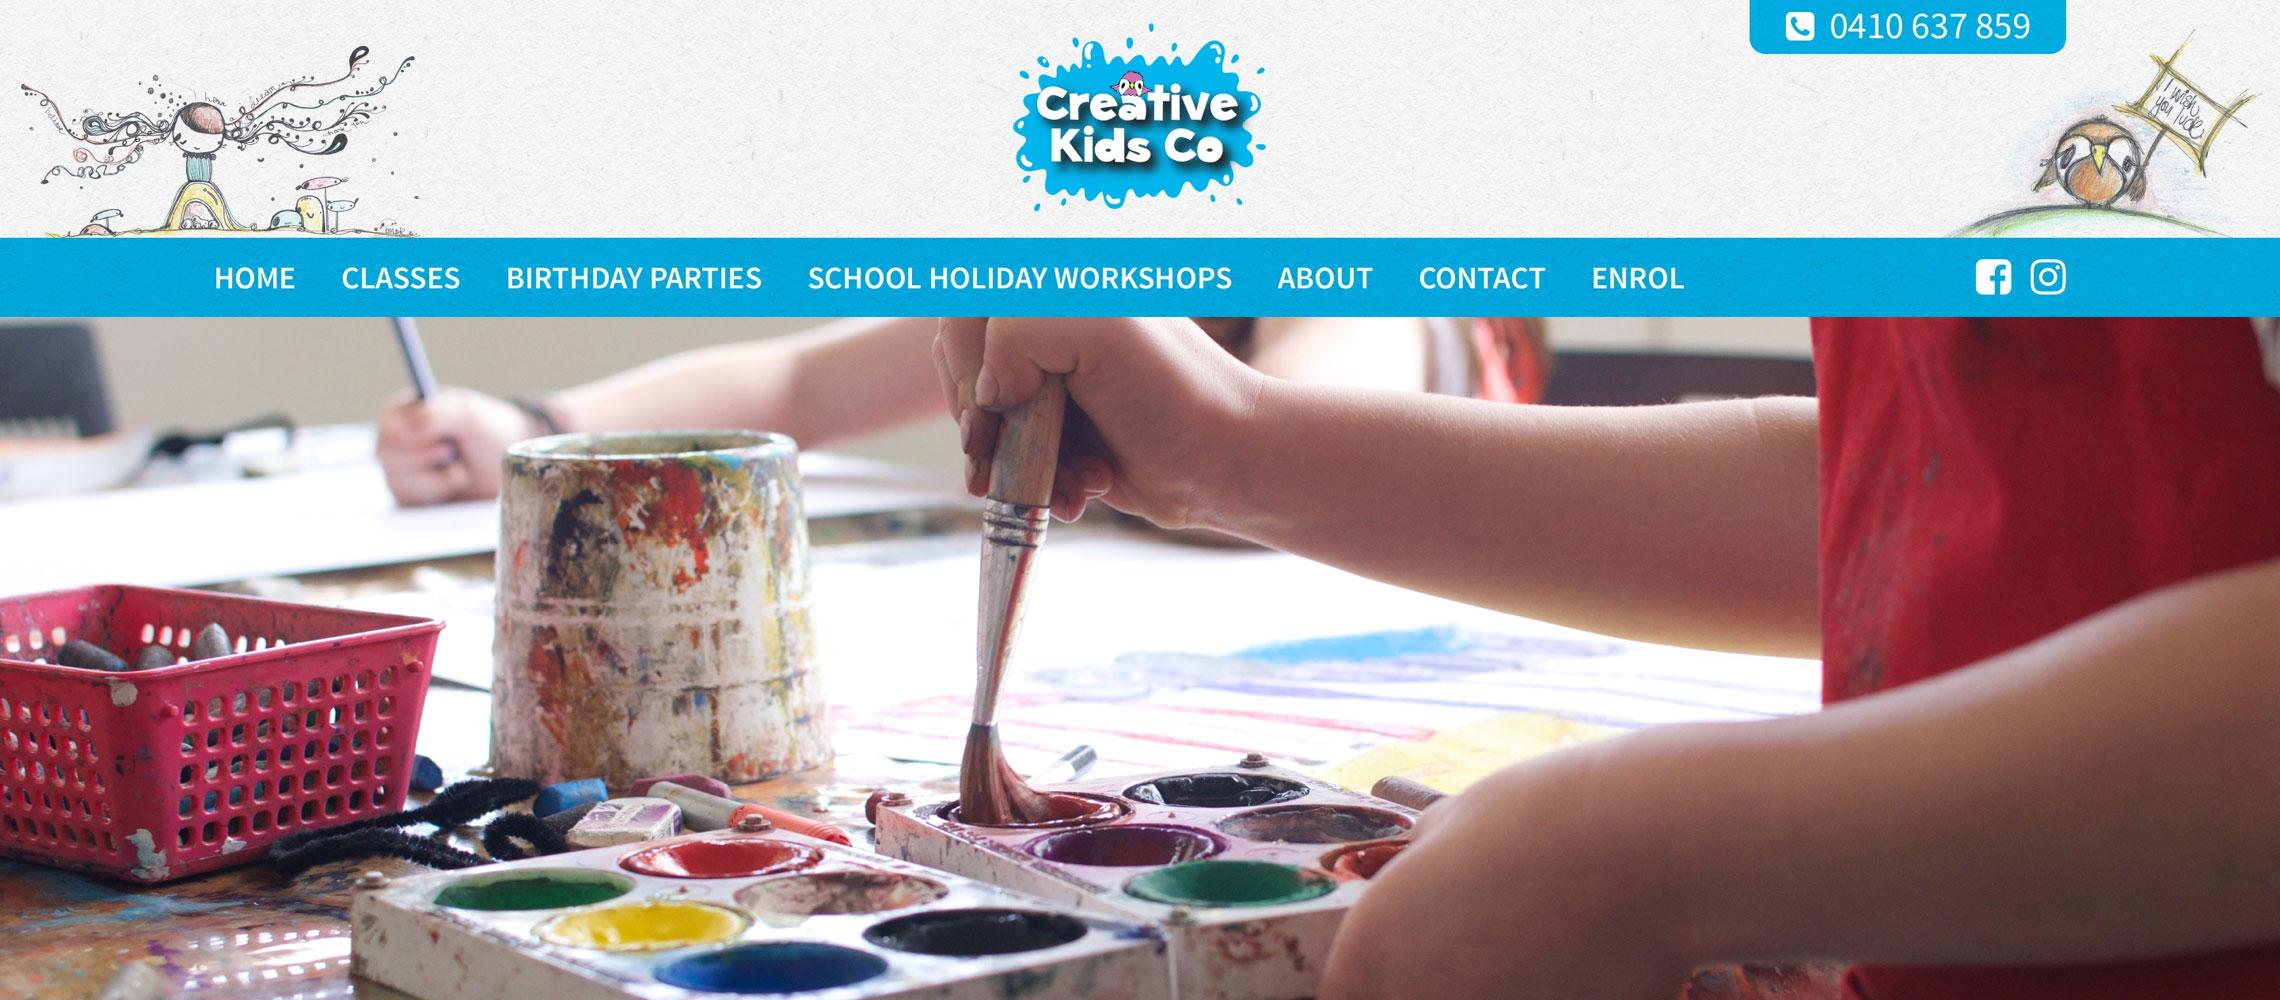 Creative Kids Co